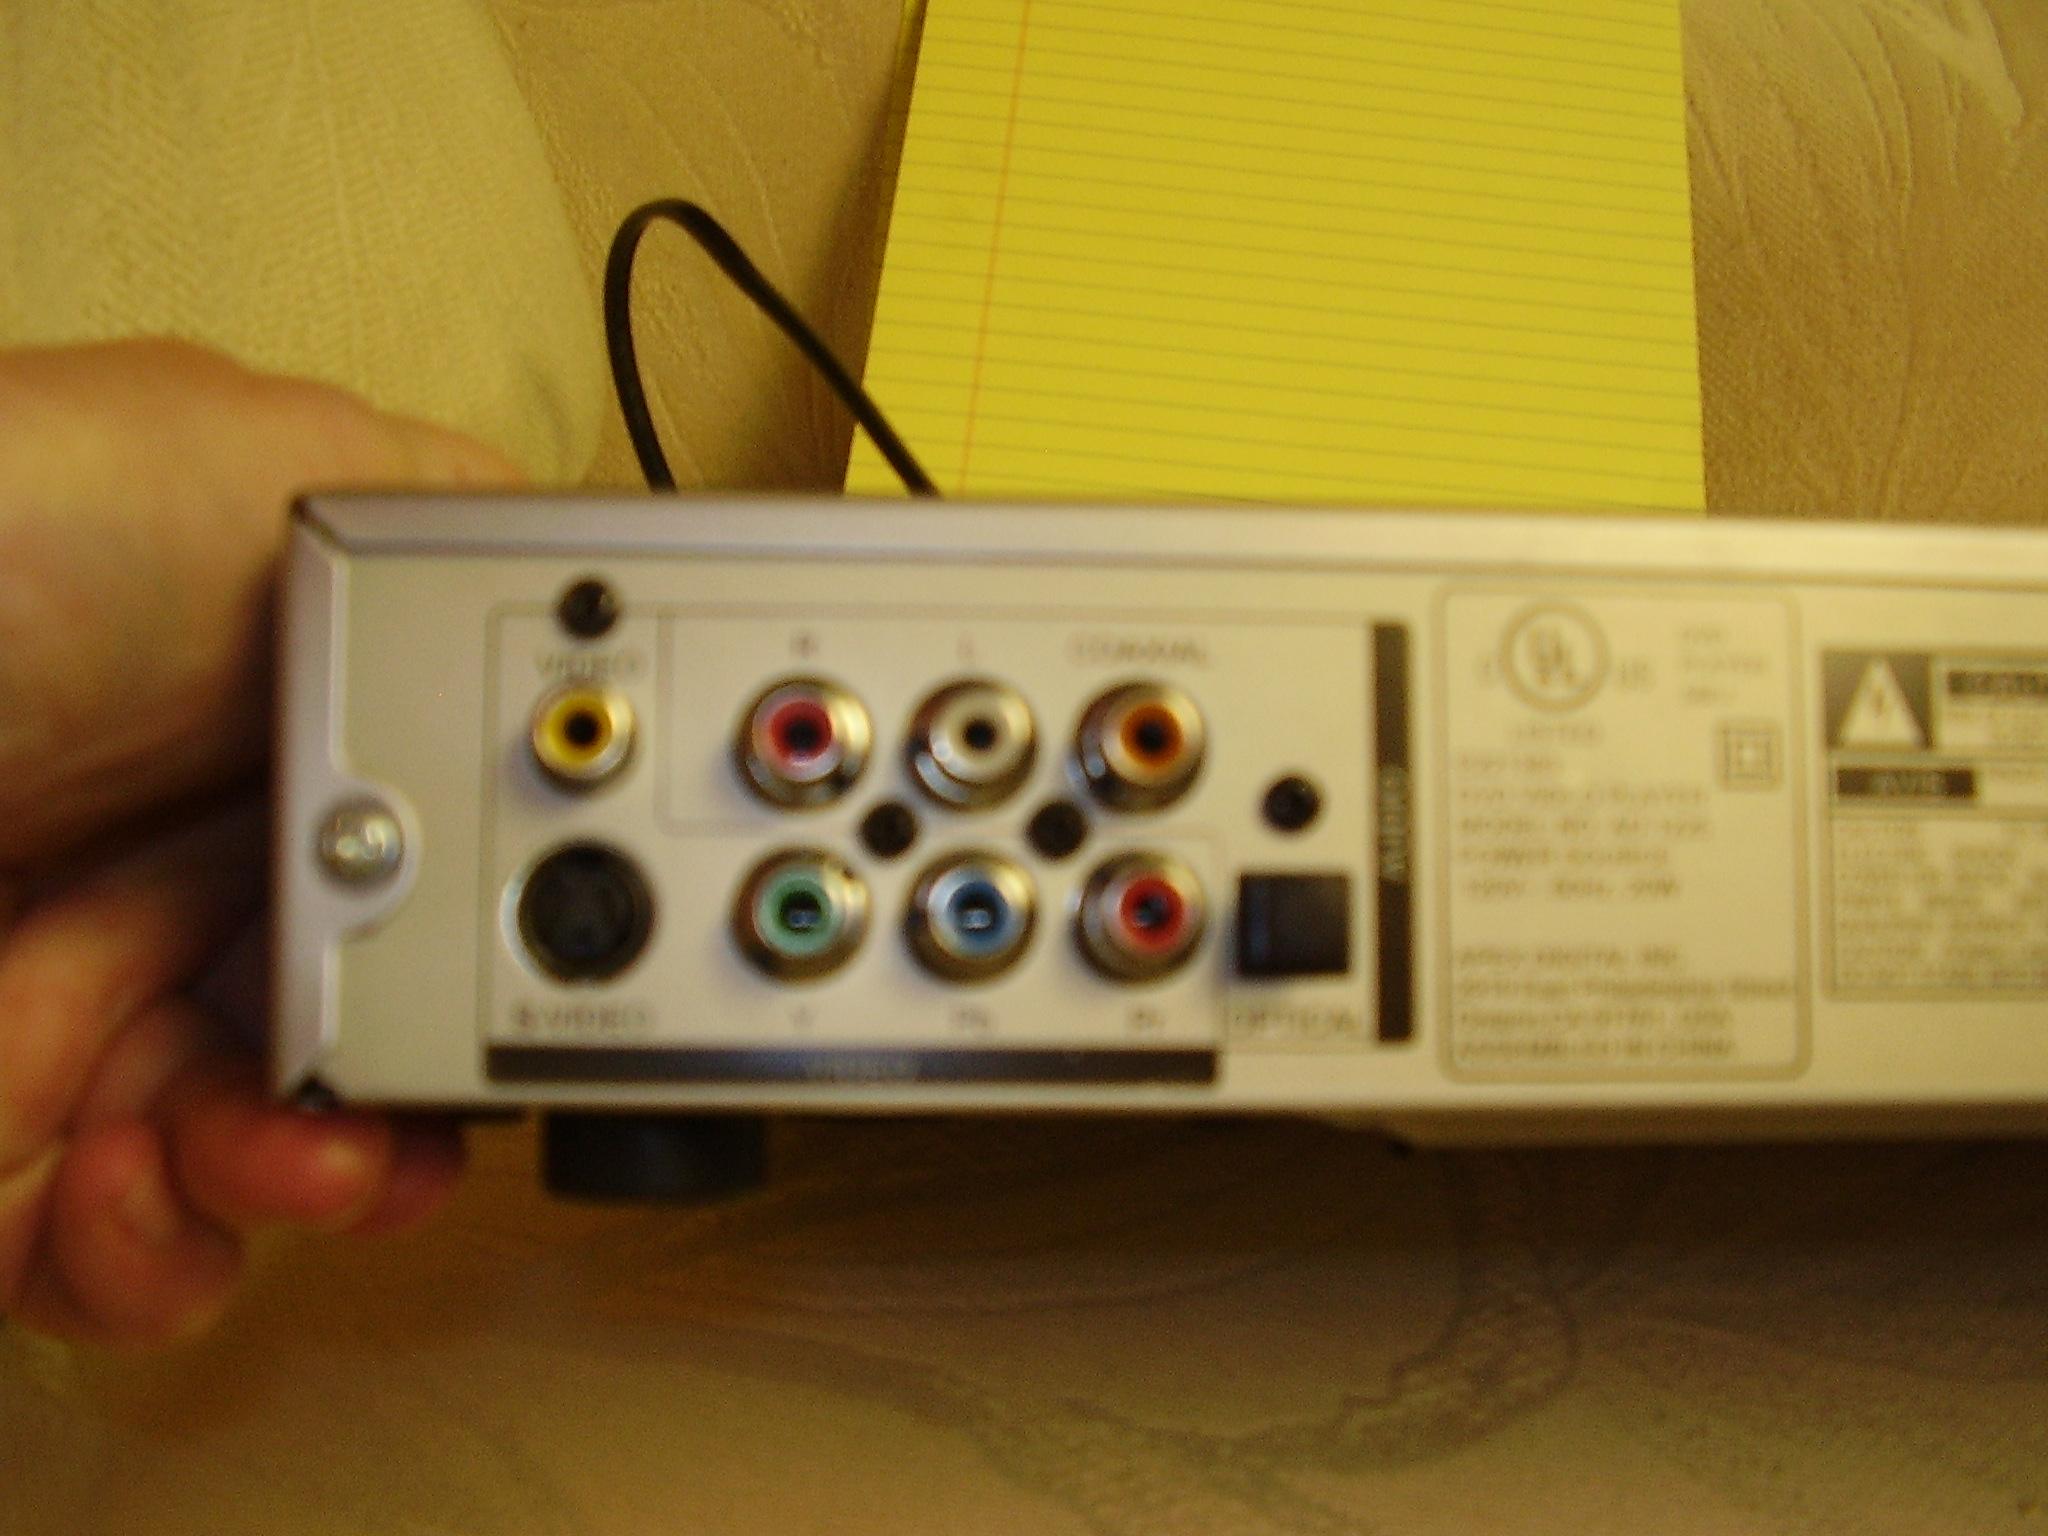 HT-r320 Onkyo hookup